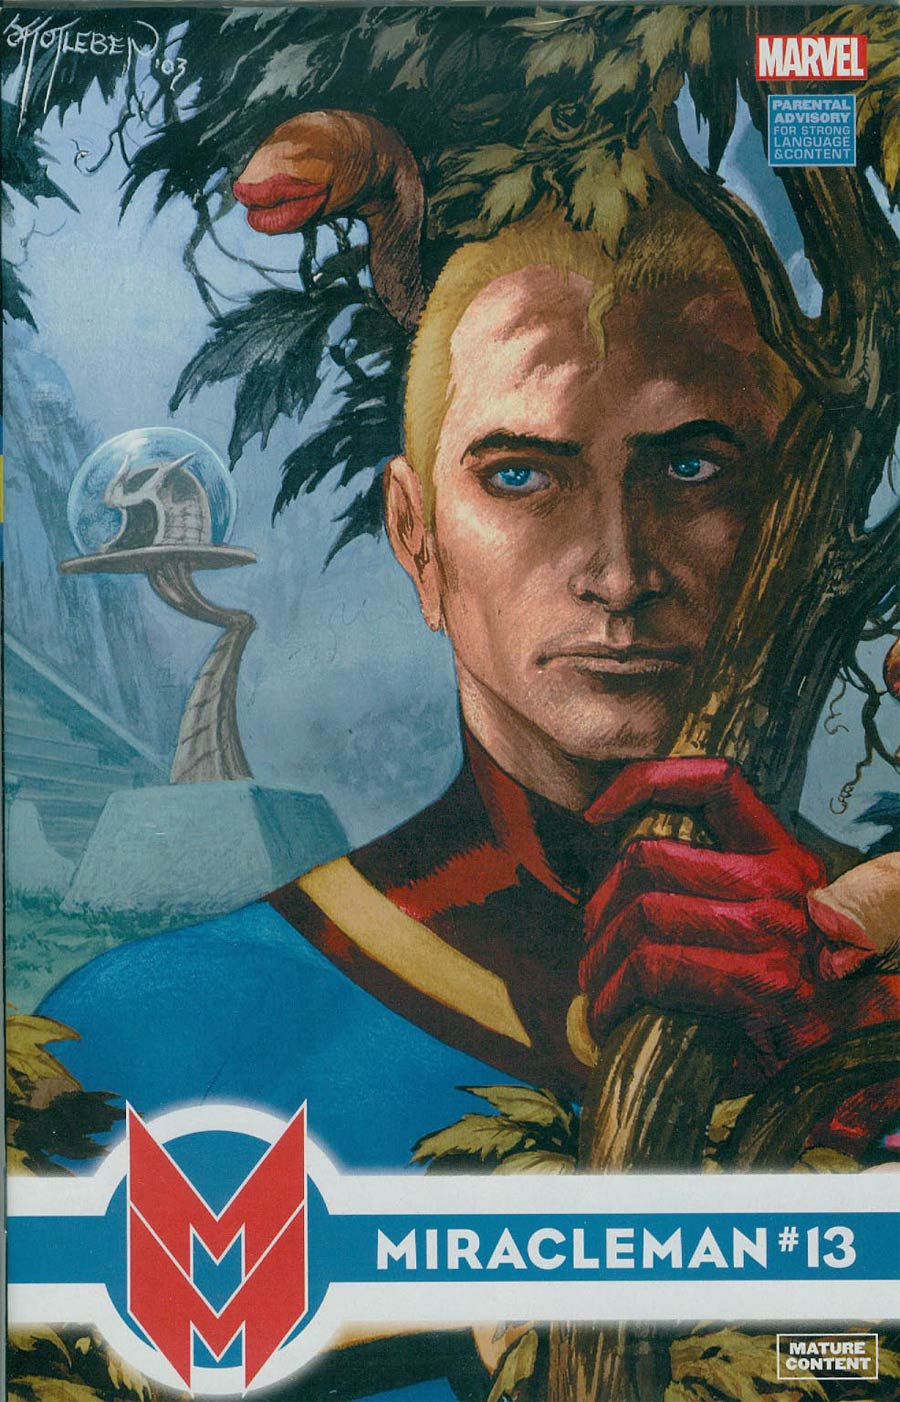 Miracleman (Marvel) #13 Cover A Regular John Totleben Cover With Polybag